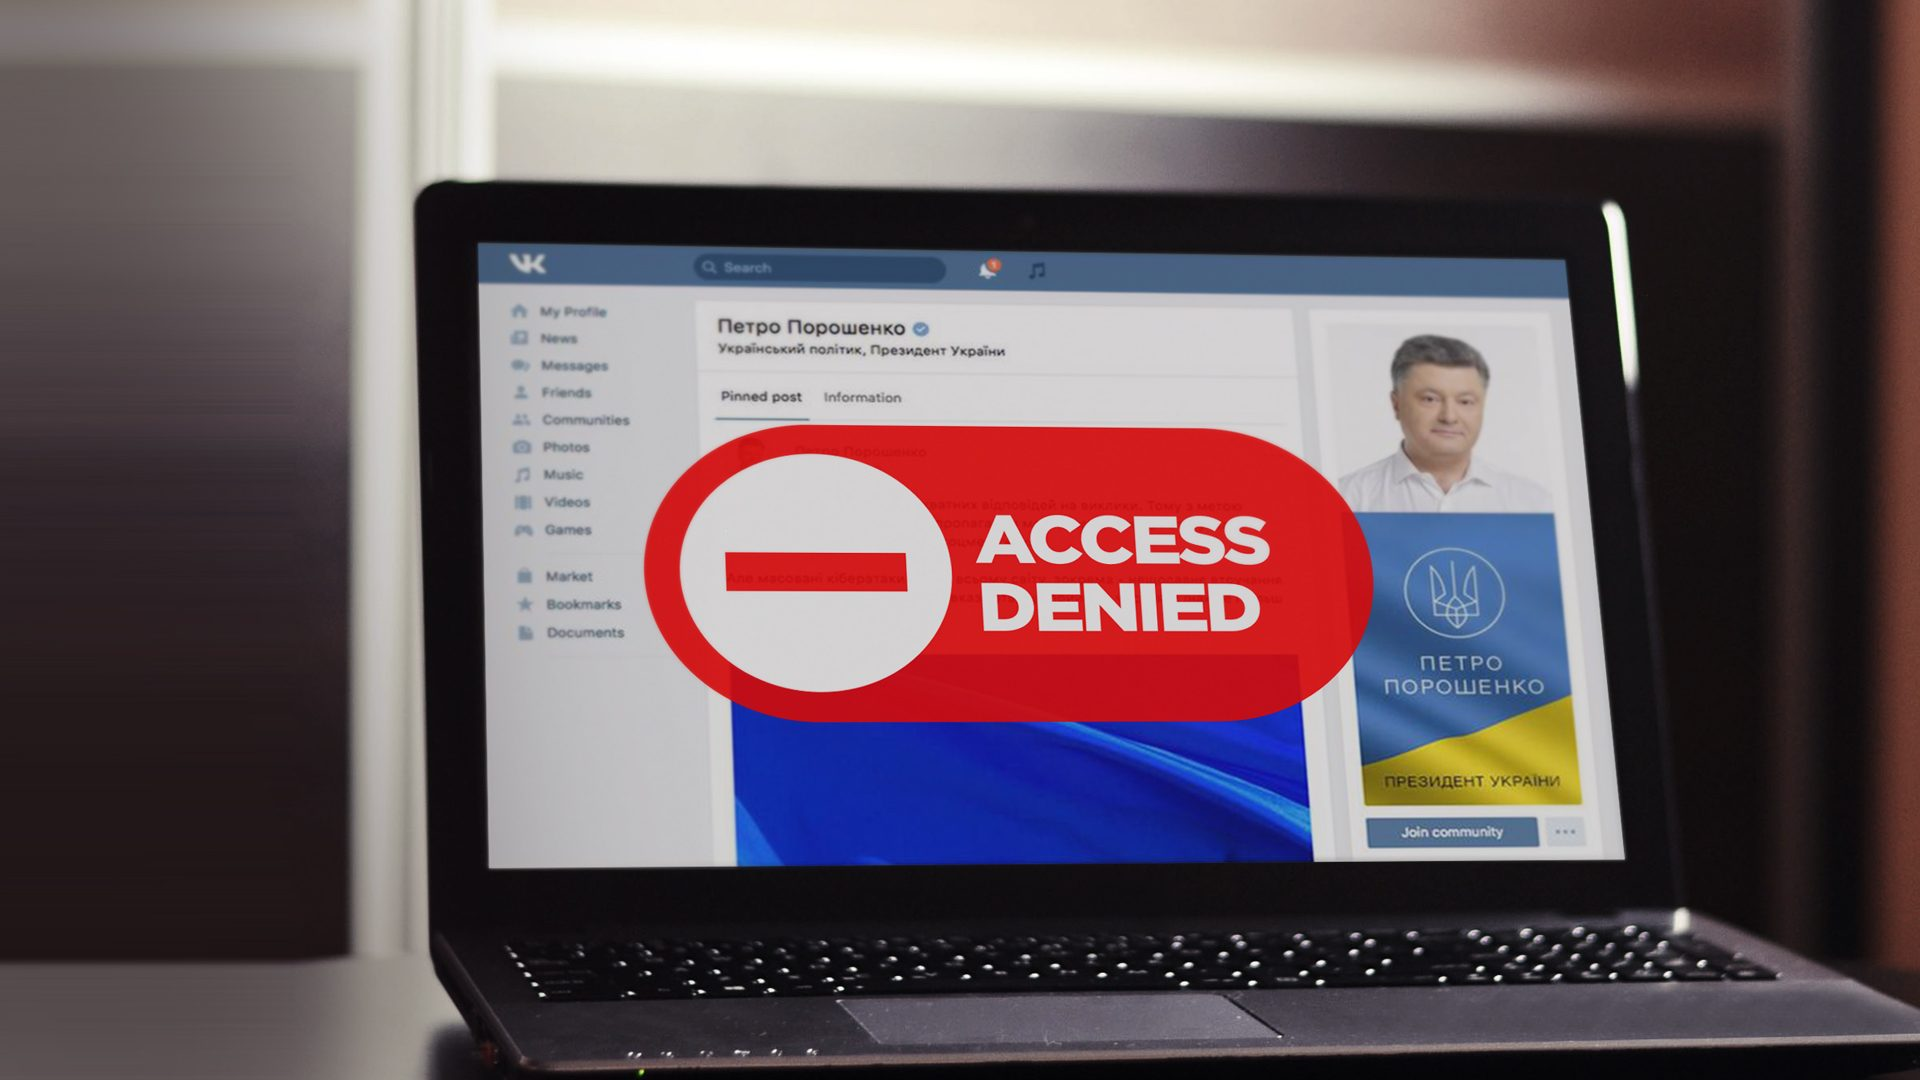 Ukraine blocks access to Russian Internet